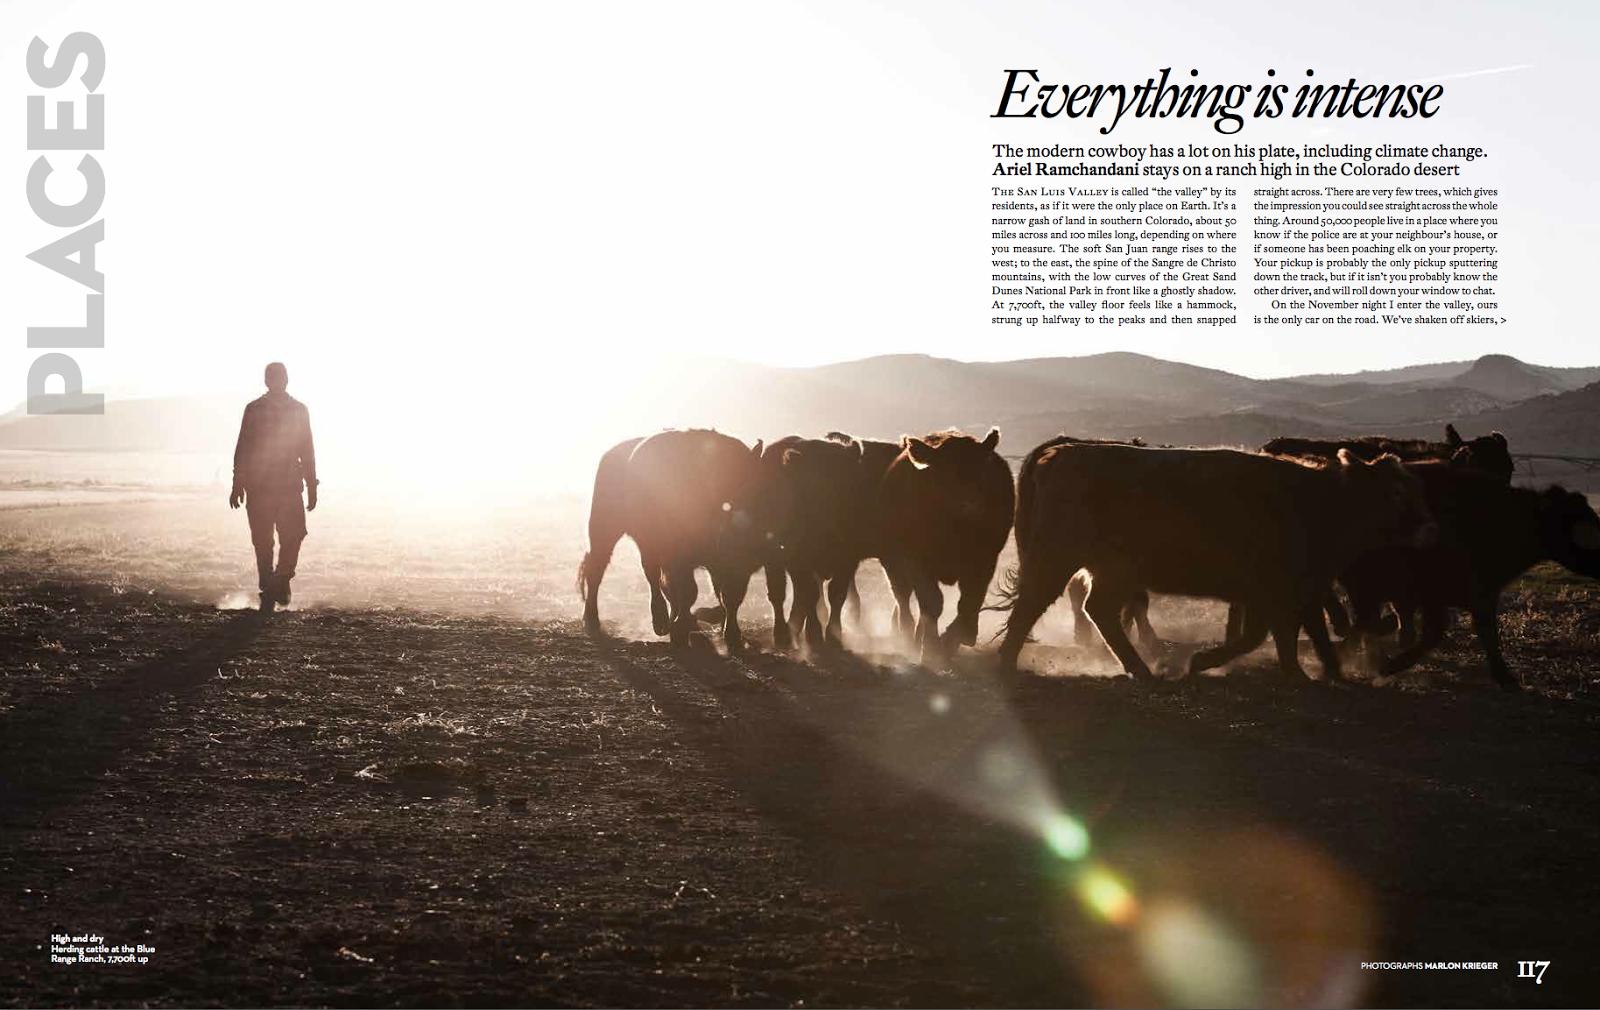 21st Century Cowboy by Ariel Ramchandani